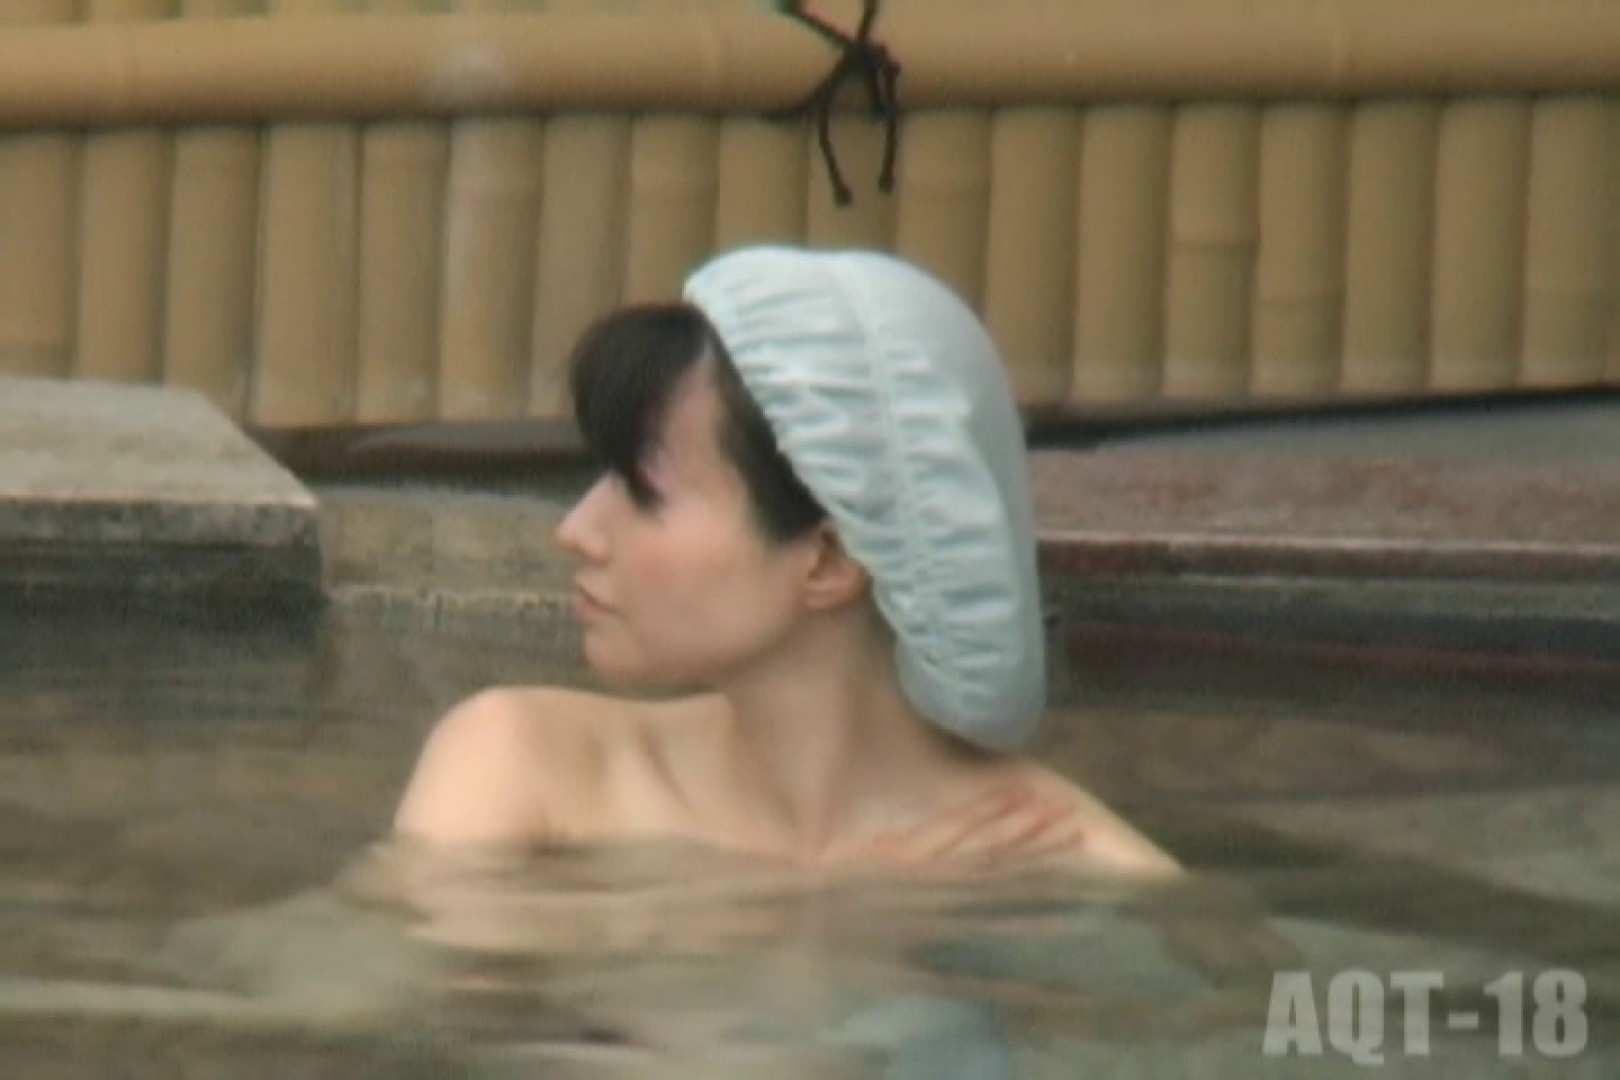 Aquaな露天風呂Vol.864 盗撮 のぞき動画画像 68画像 41